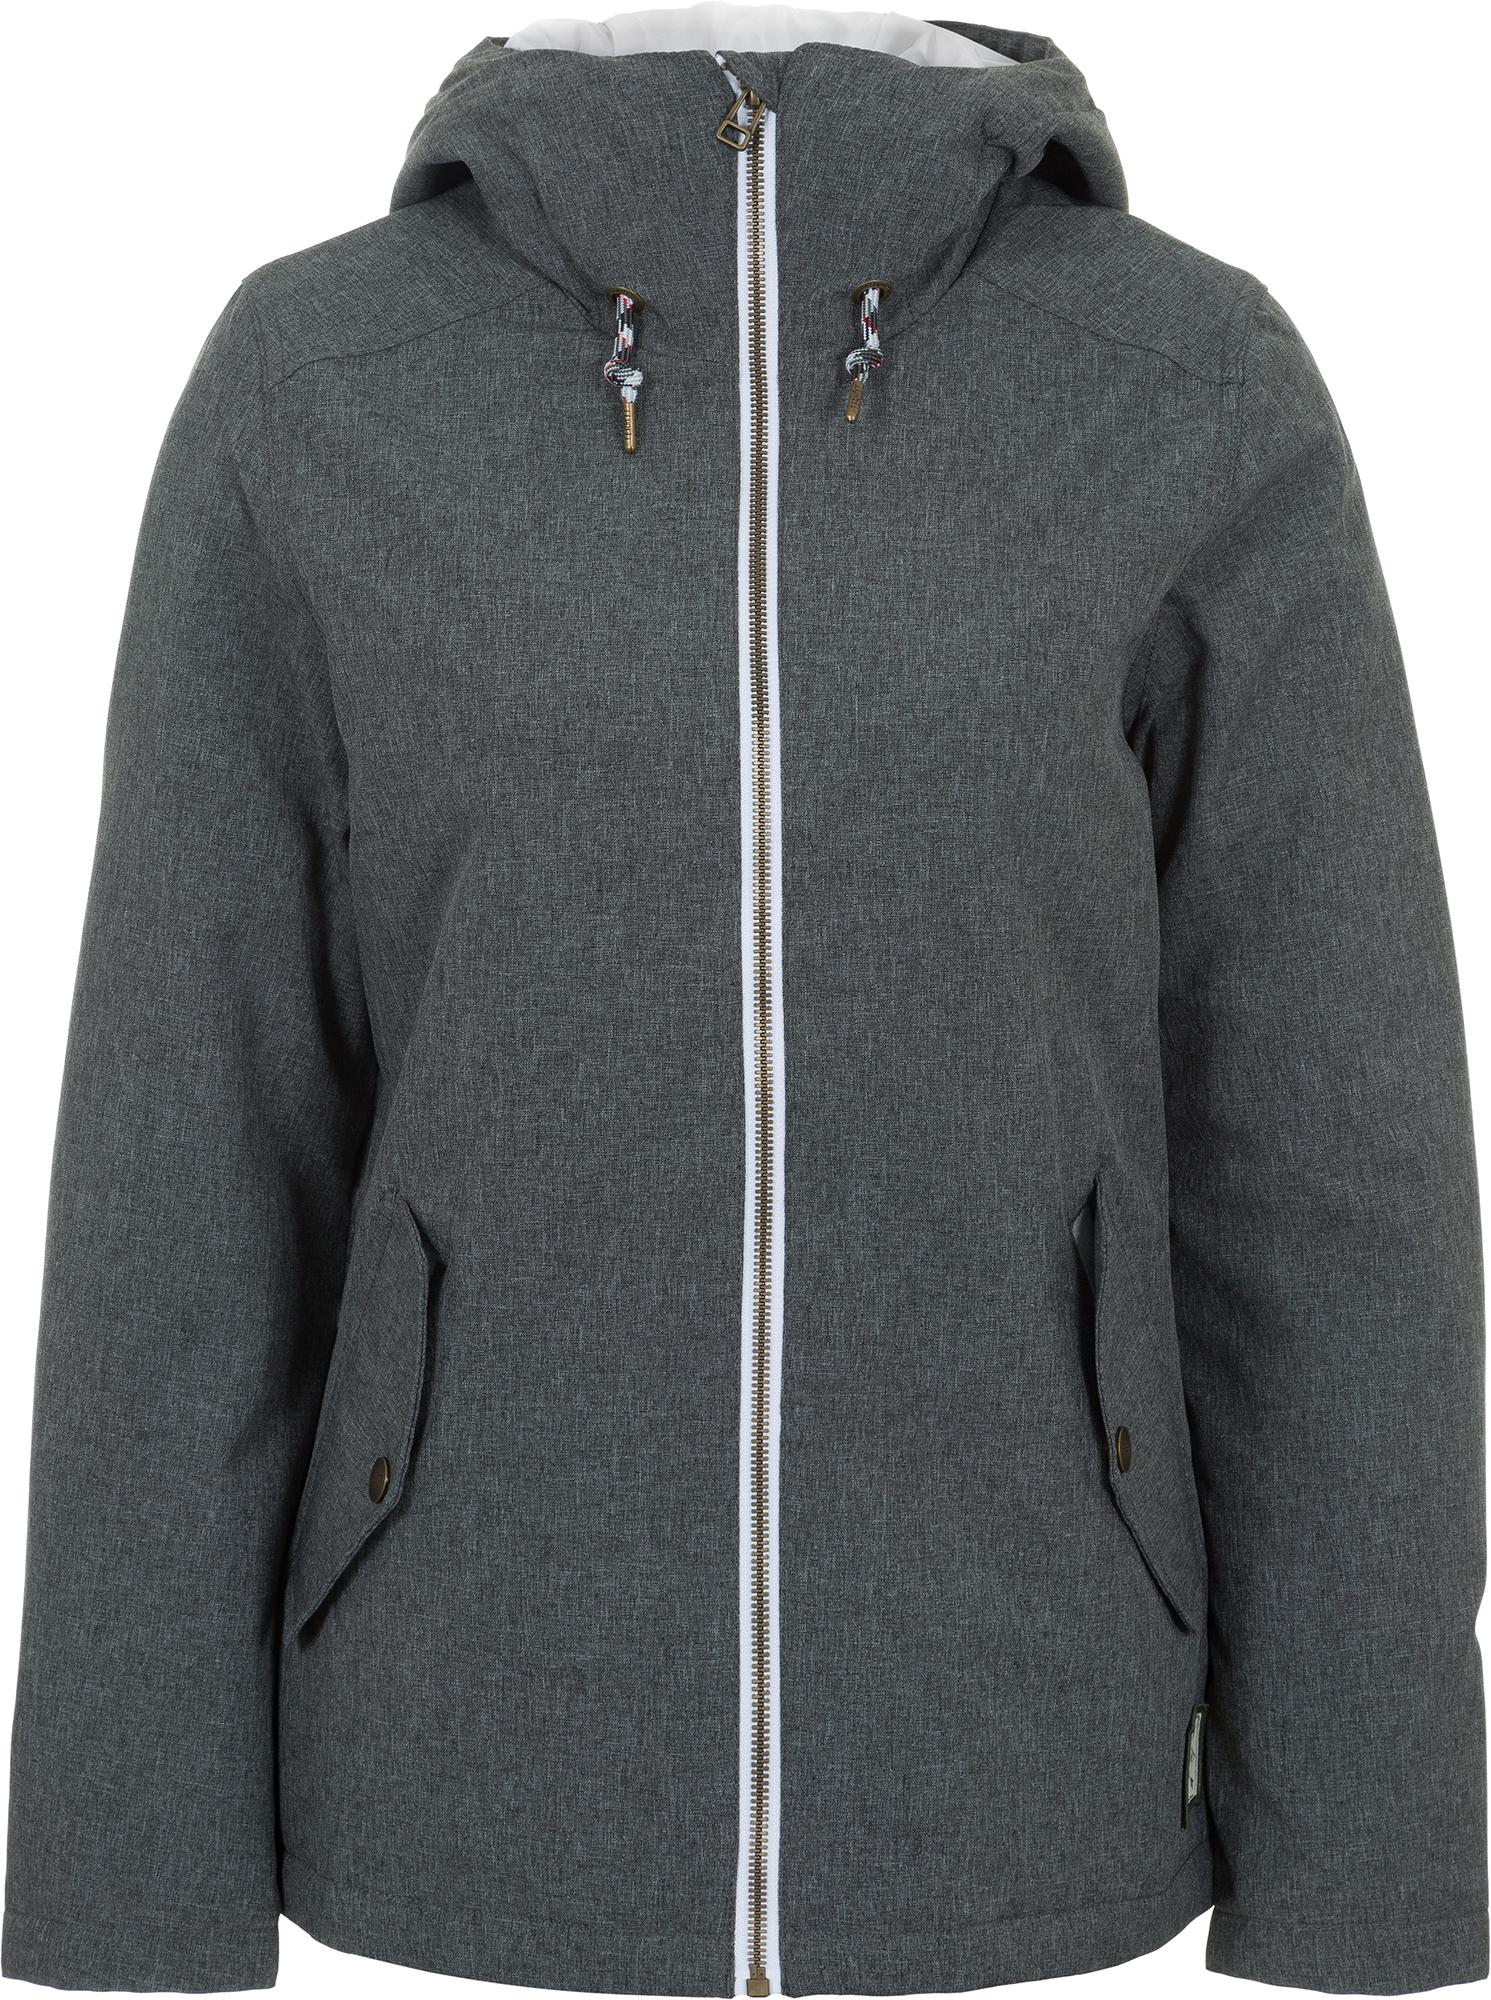 Termit Куртка утепленная женская Termit, размер 44